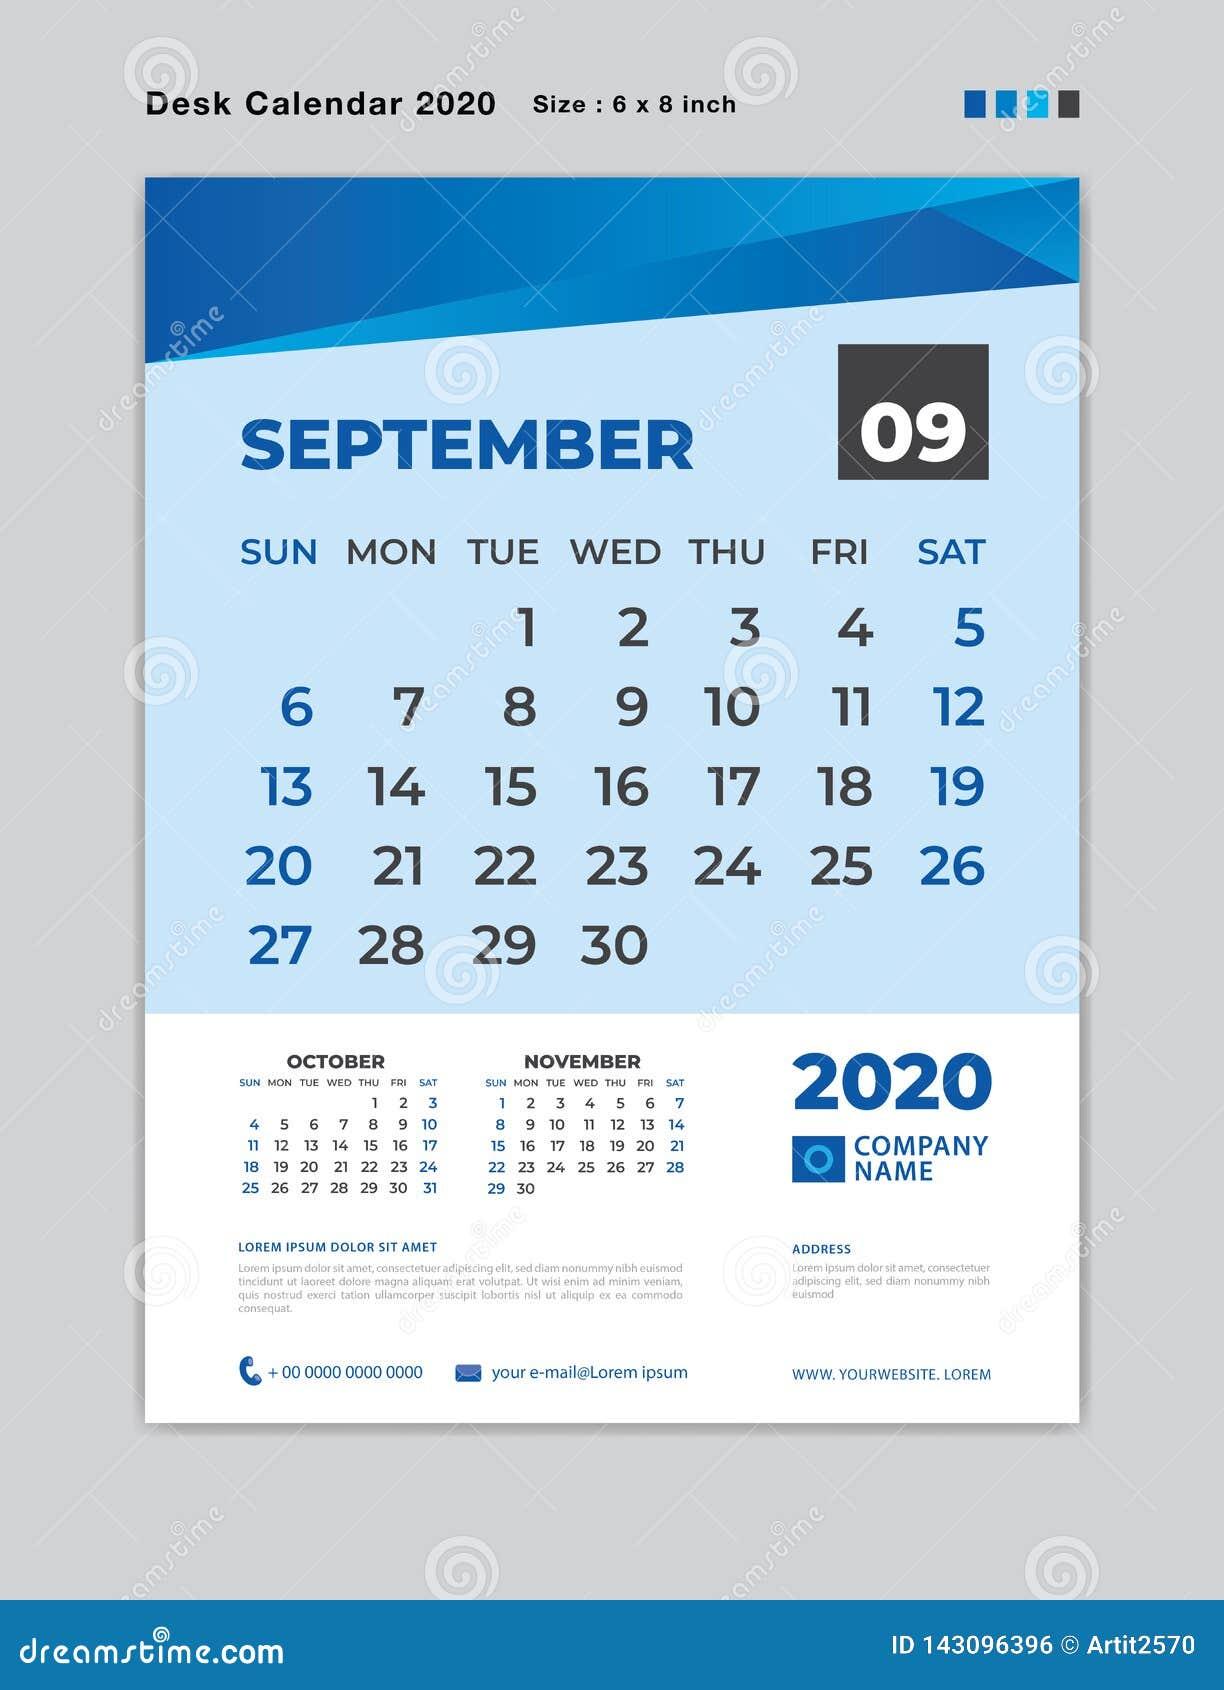 Ut Calendar 2020 SEPTEMBER 2020 Month Template, Desk Calendar For 2020 Year, Week